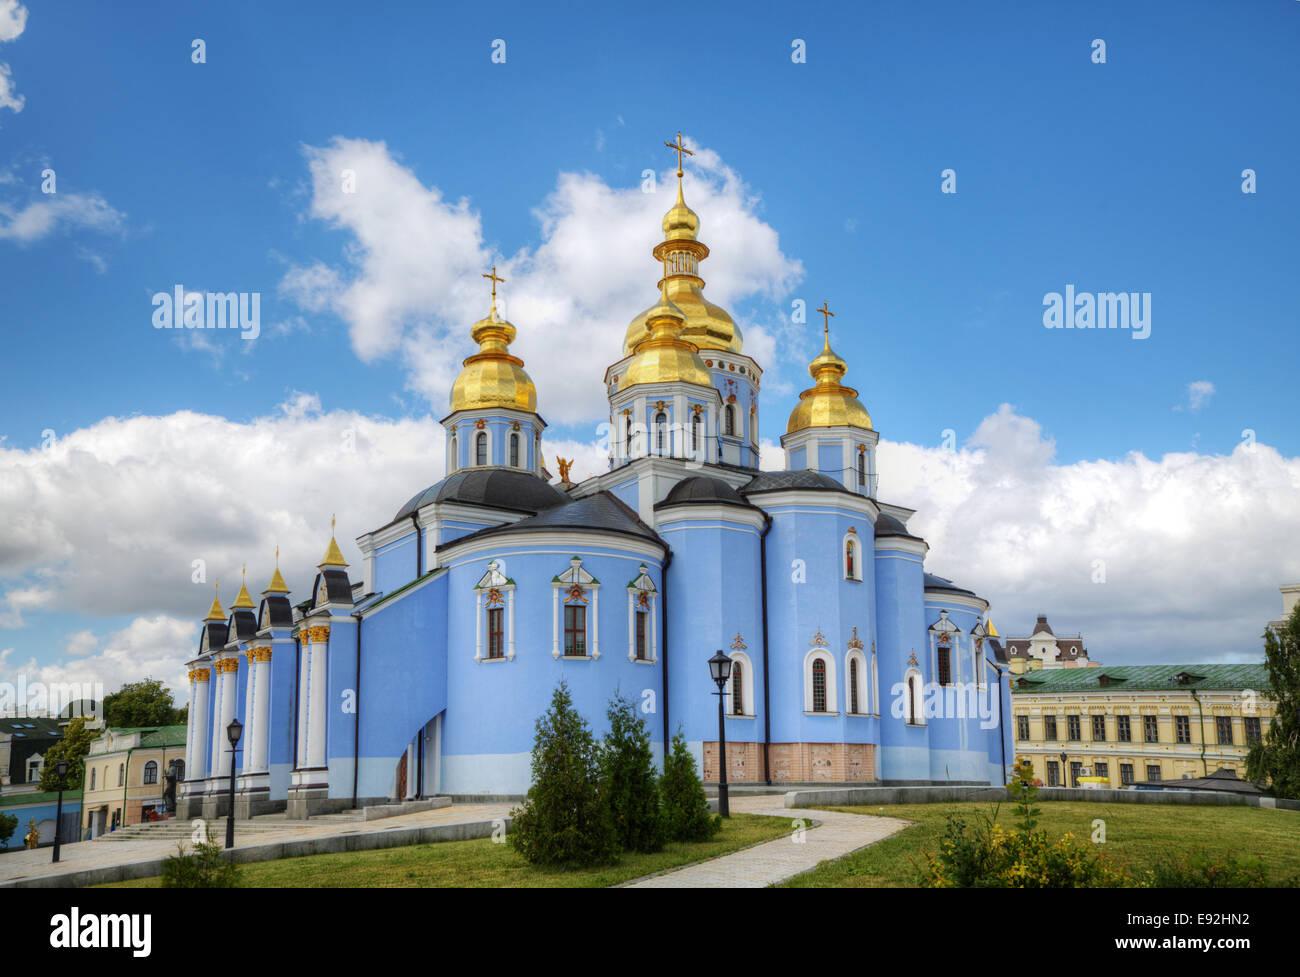 St. Michael monastery in Kiev, Ukraine - Stock Image